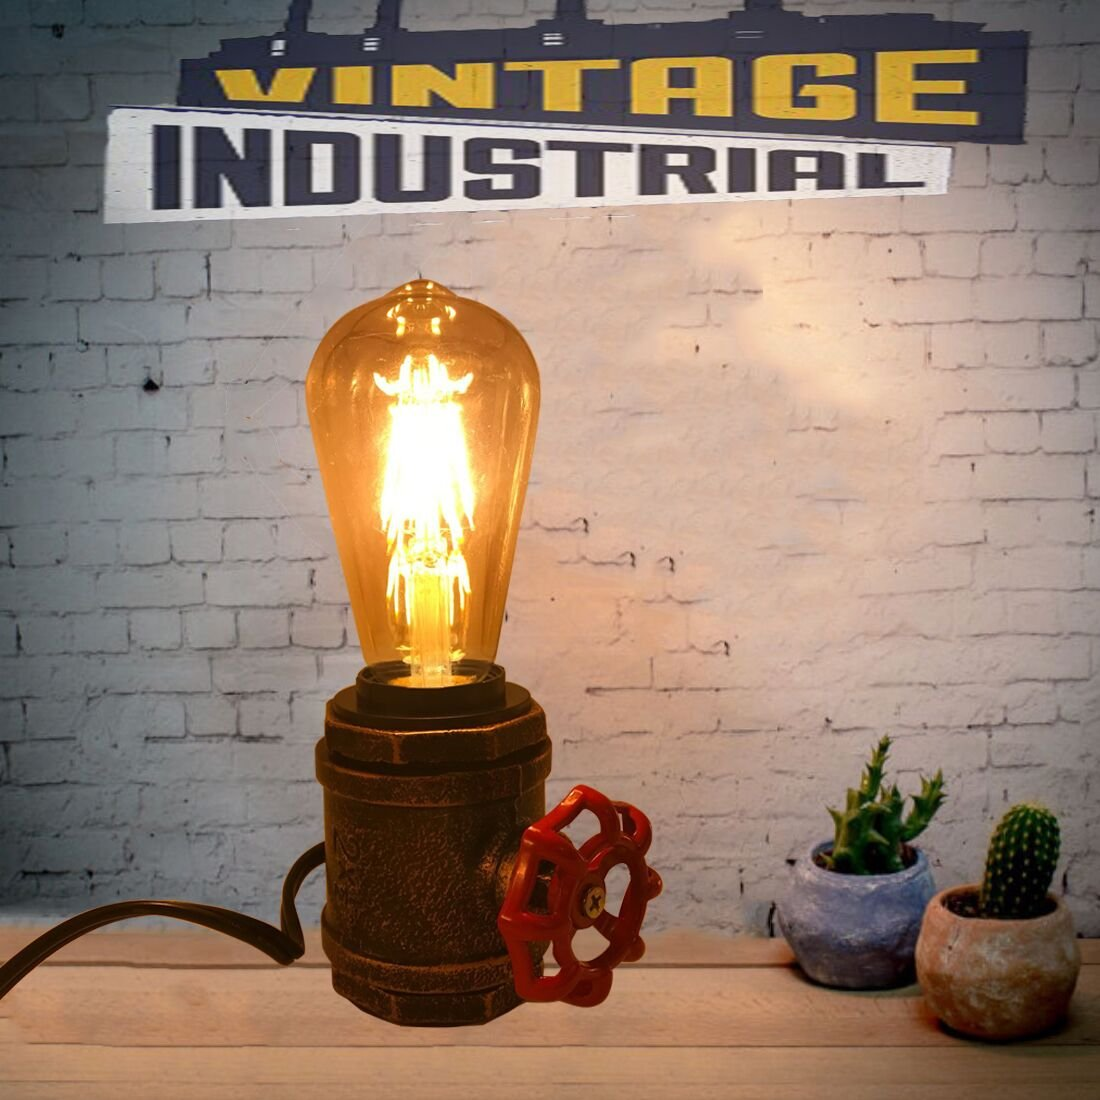 Gold DEC LUCE DECOLUCE LIGHTING Gold Industrial Vintage Small Table Desk Lamp Retro Loft Rustic Steampunk Iron Without Edison Bulb,Antique Desk Lamps Bedside Living Room Bedroom Home Decor